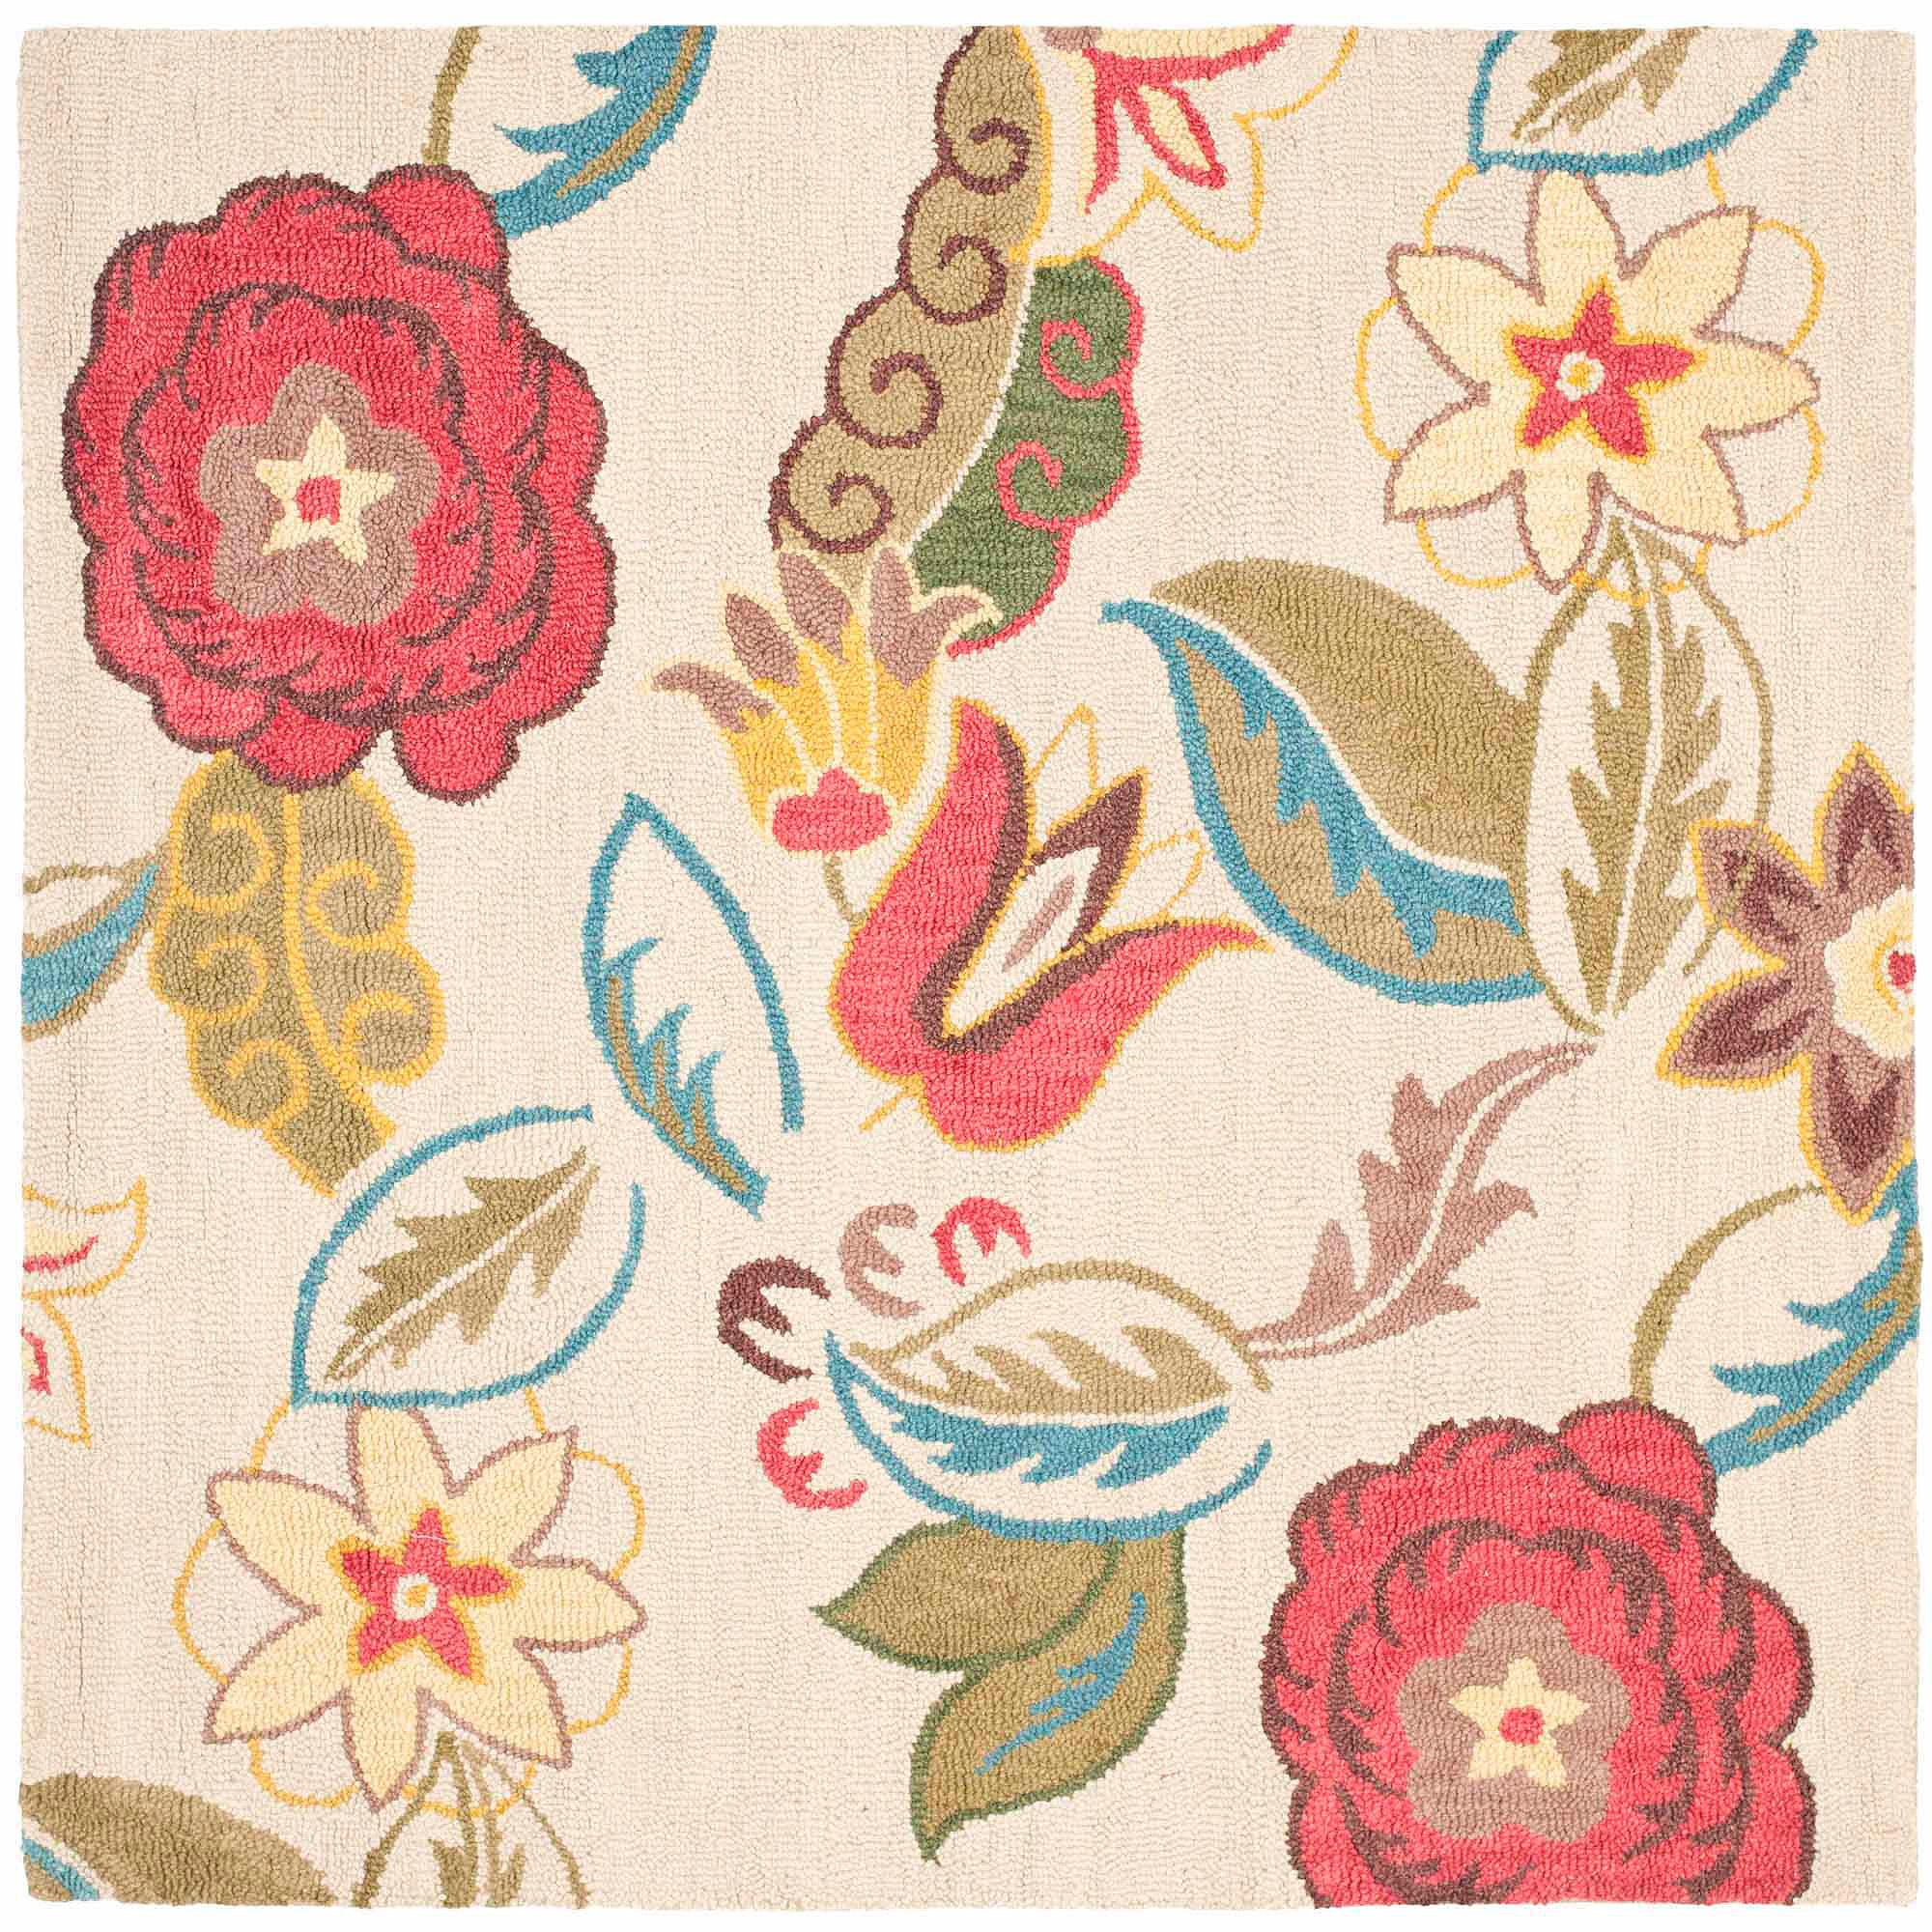 Safavieh Blossom Nancy Wool Area Rug, Beige/Multi